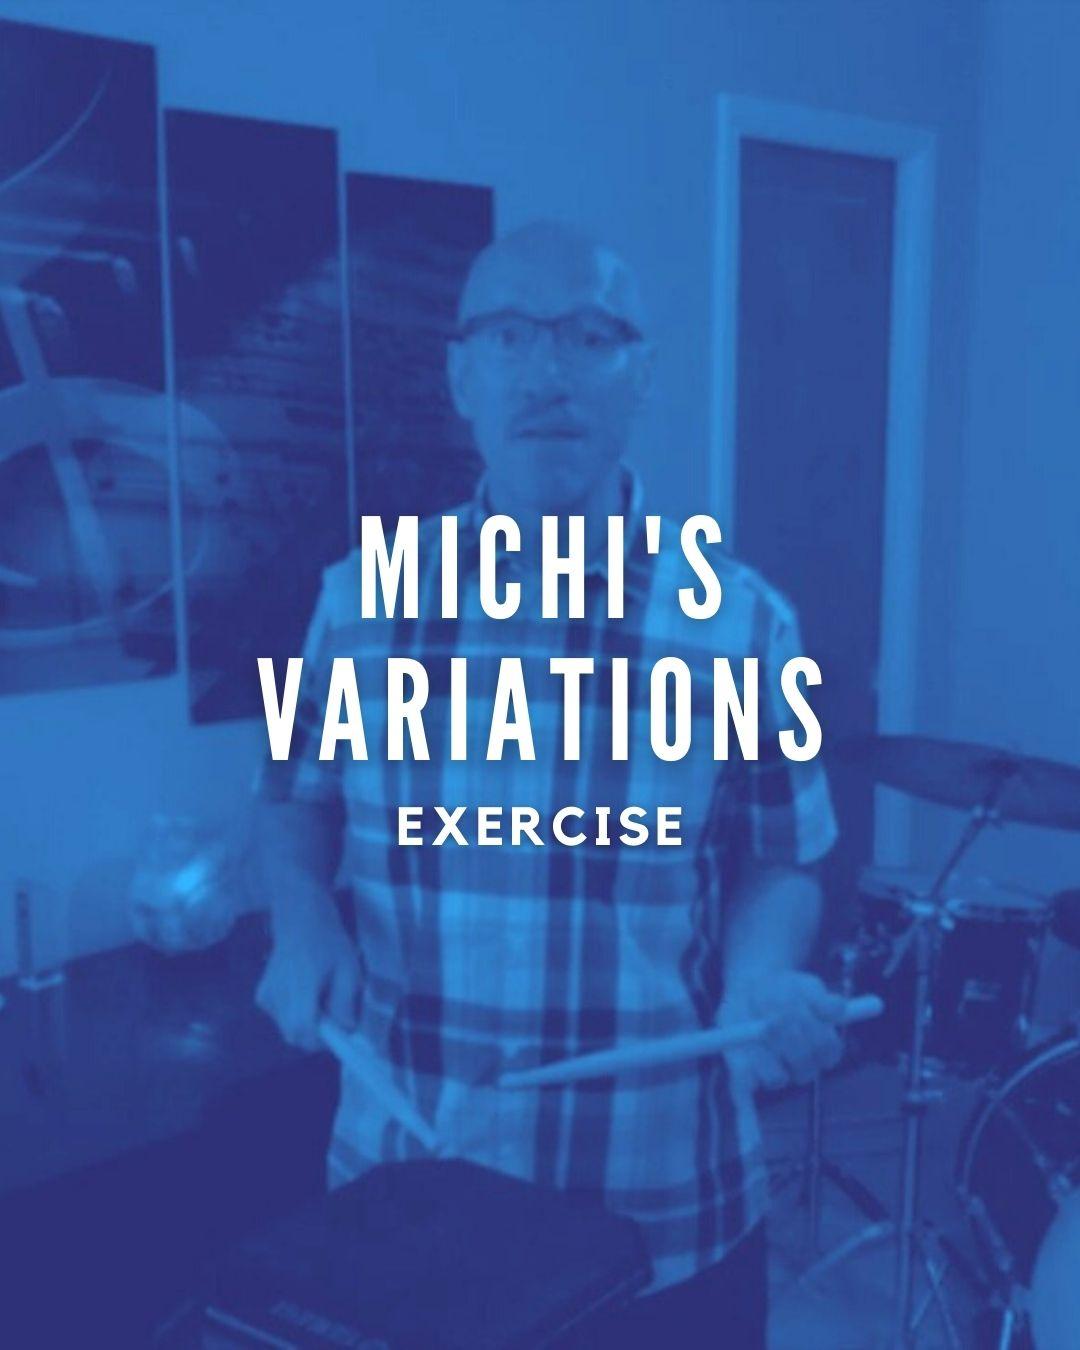 Michi's Variations